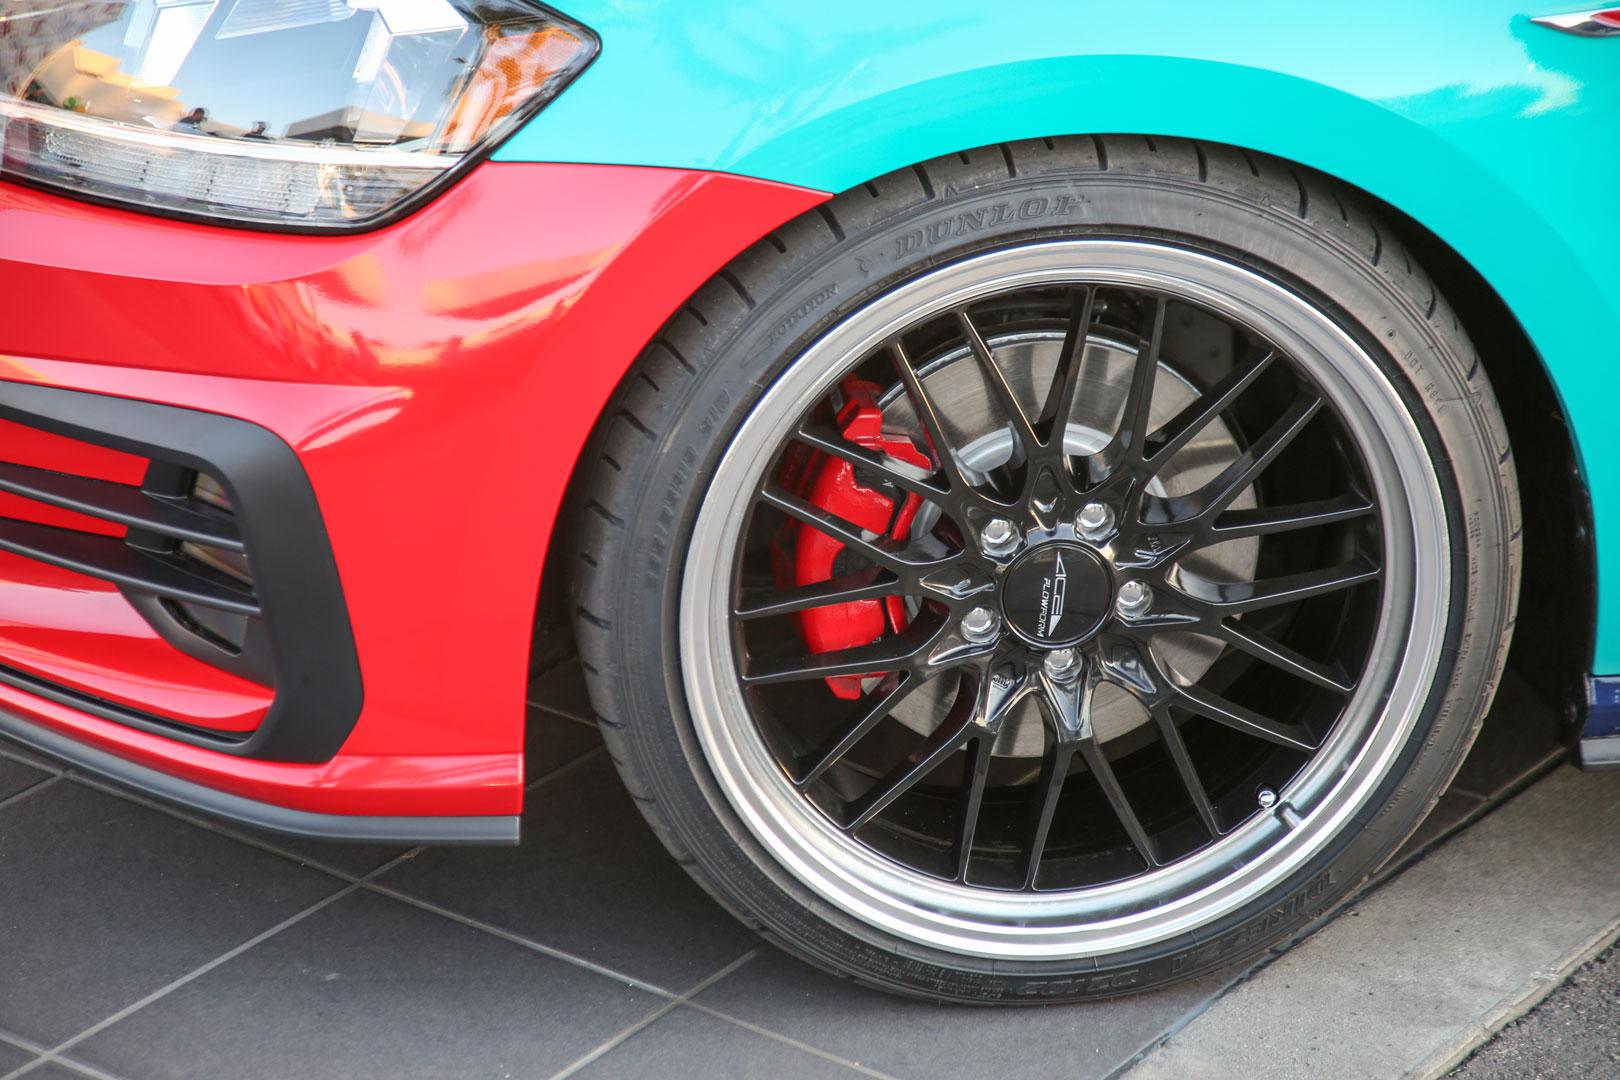 Harlequin VW Golf wheel